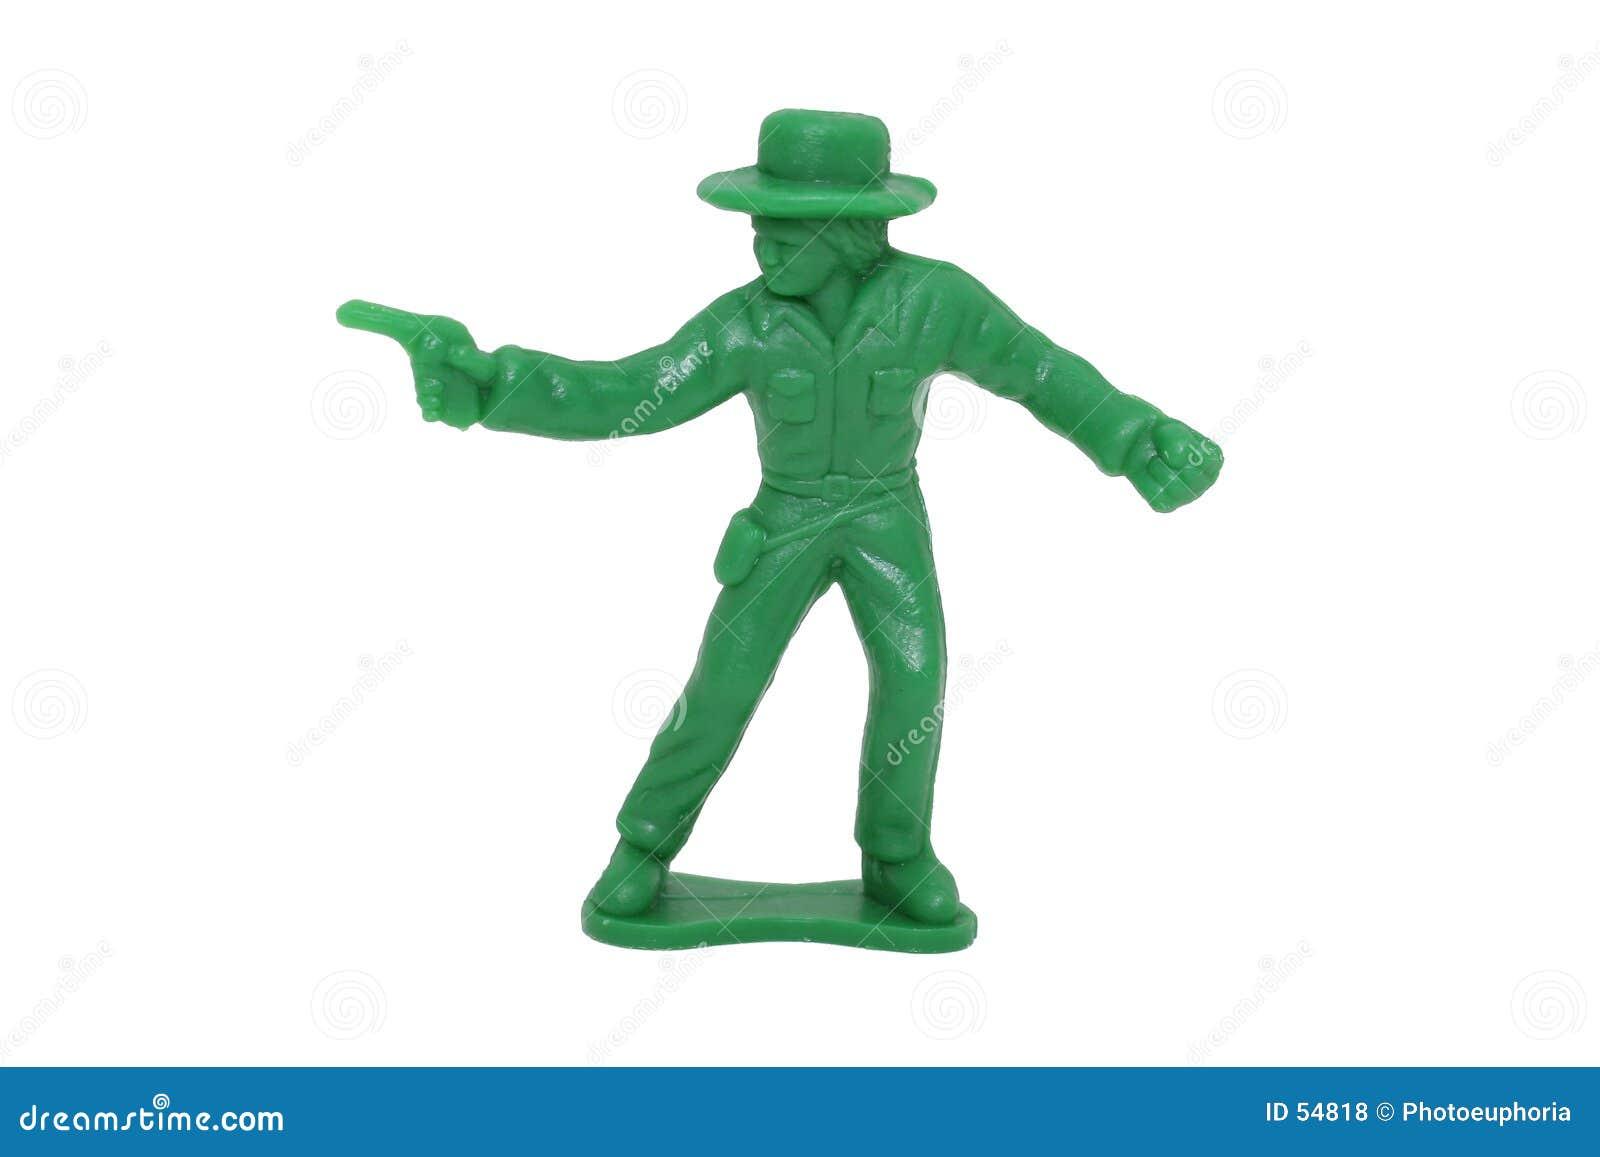 2mp 8牛仔绿色图象玩具